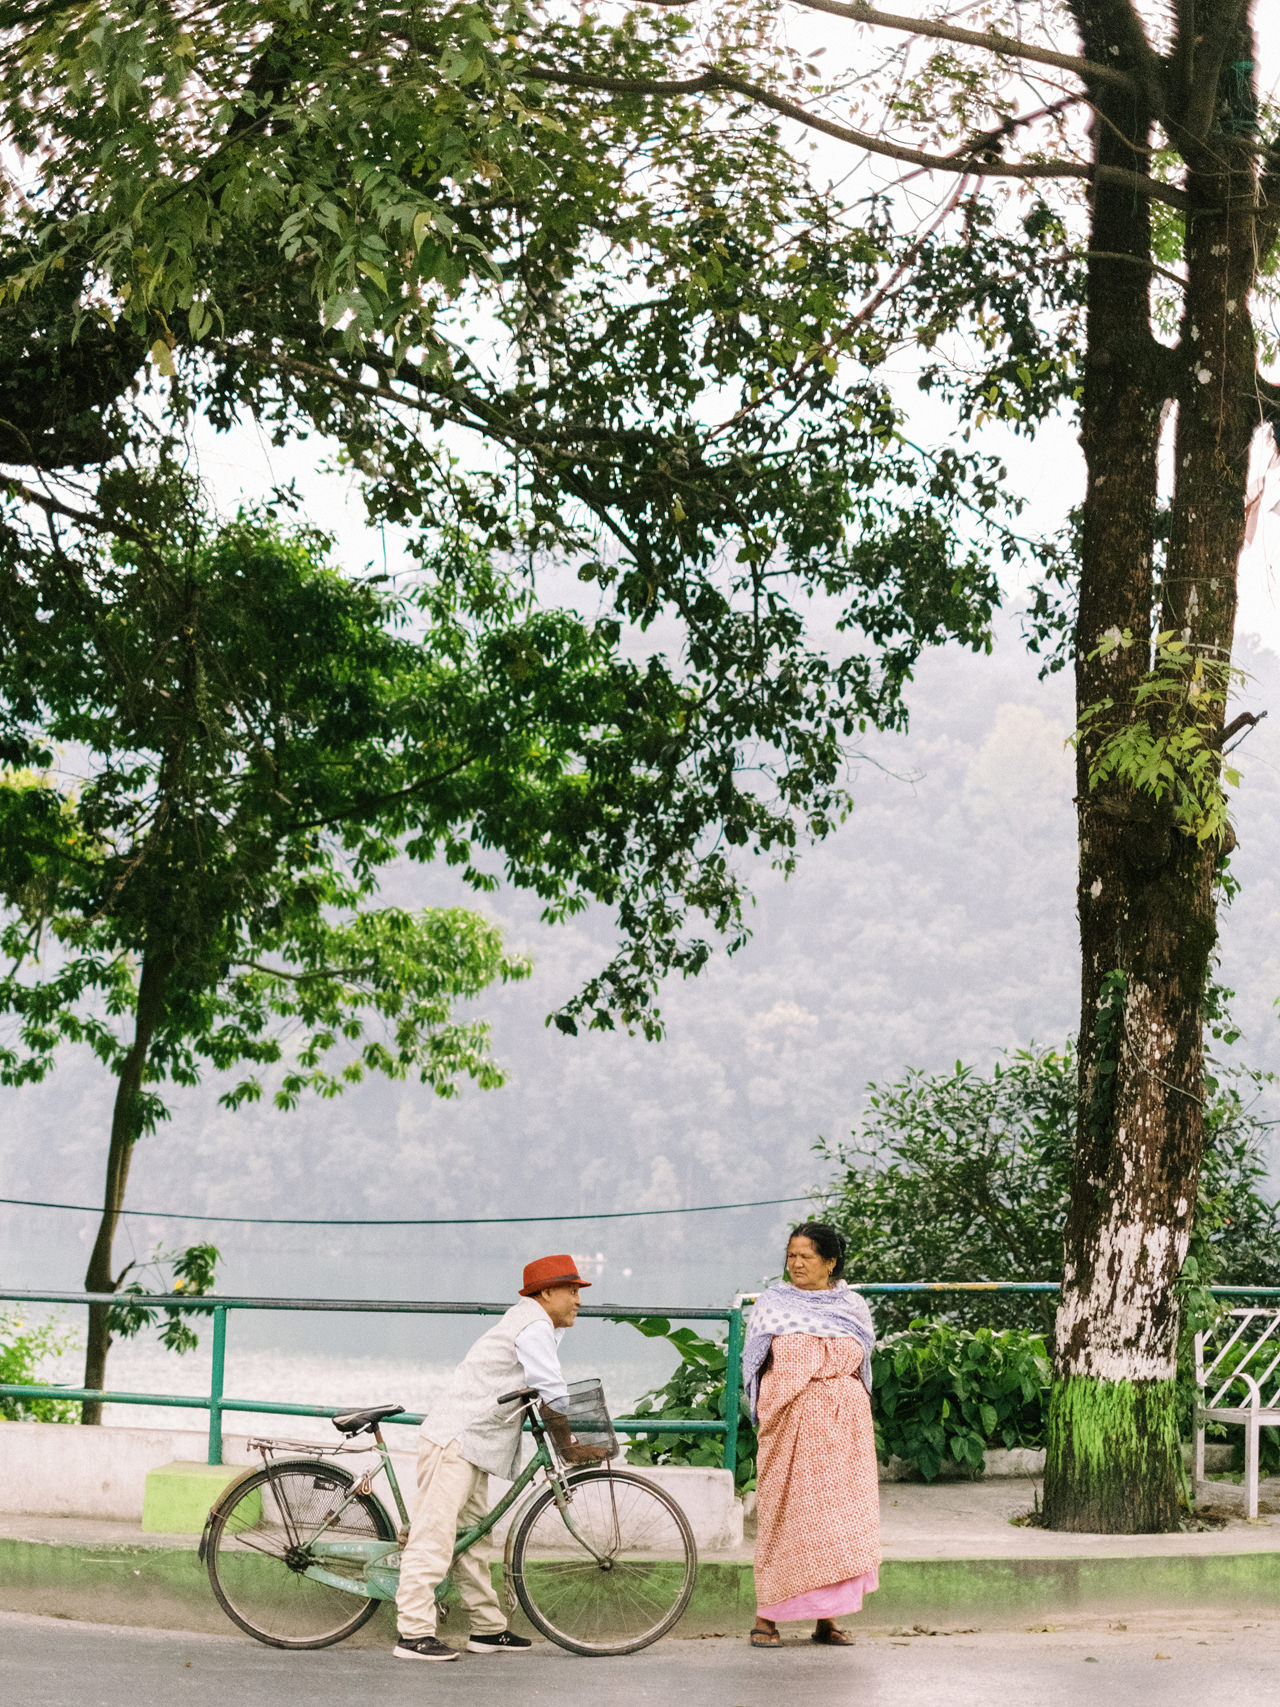 Nepal 2019 - Trekking Annapurna Base Camp 157